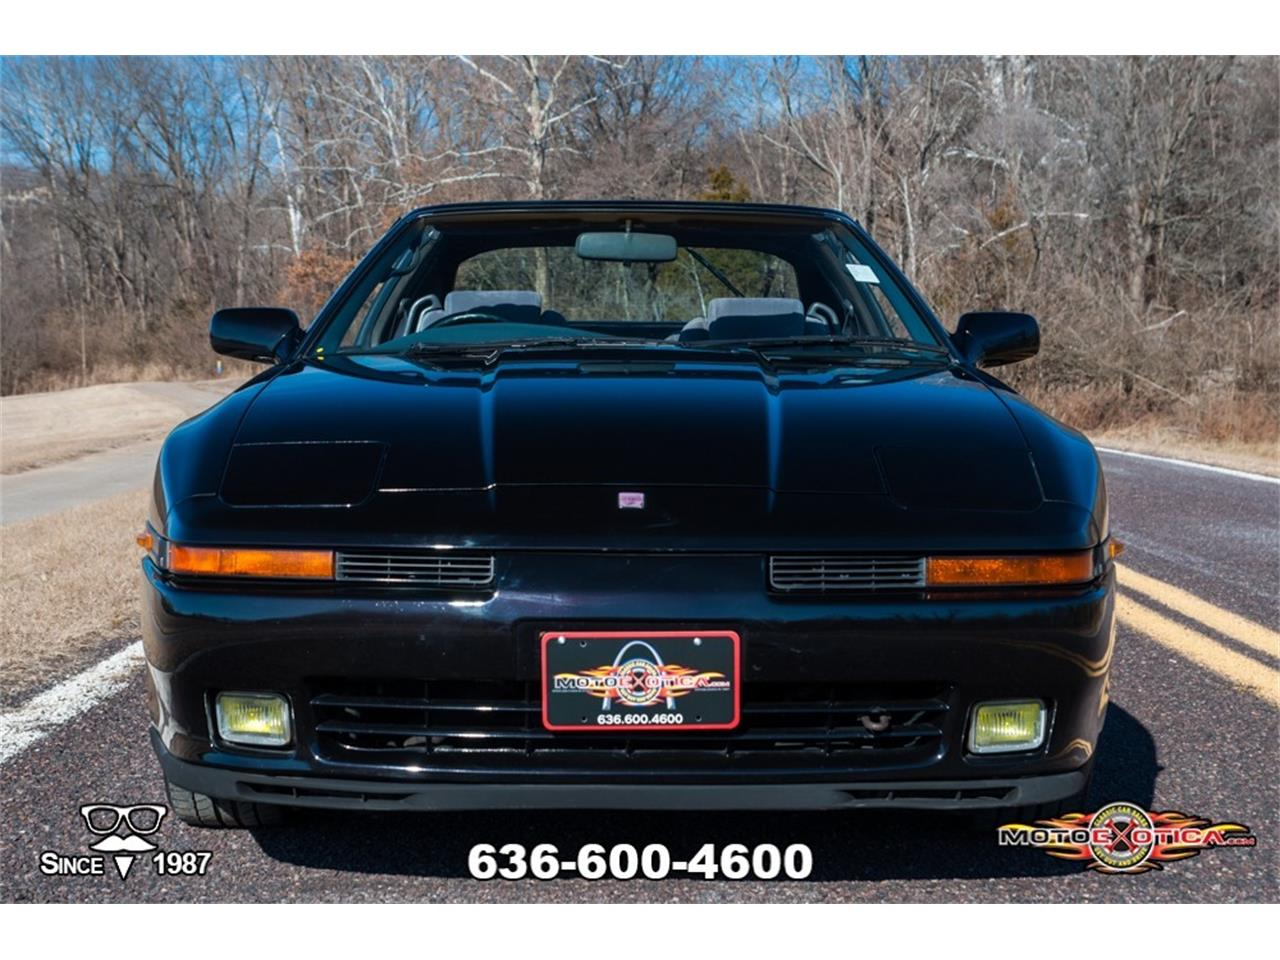 Large Picture of '90 Supra located in St. Louis Missouri - $13,900.00 - Q54H